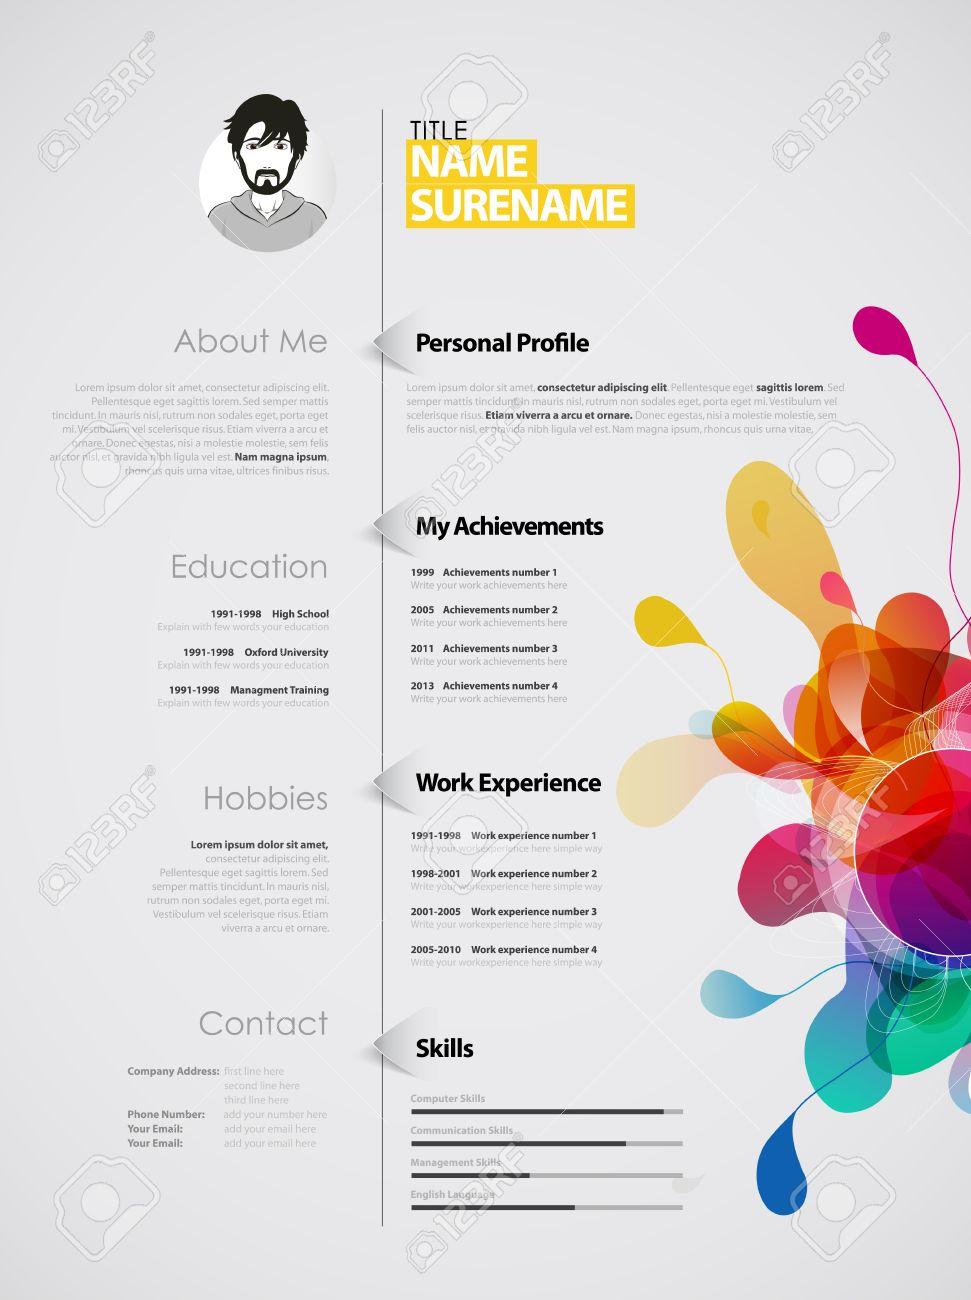 Creative color rich cv resume template creative color rich cv resume template 62461670 yelopaper Image collections